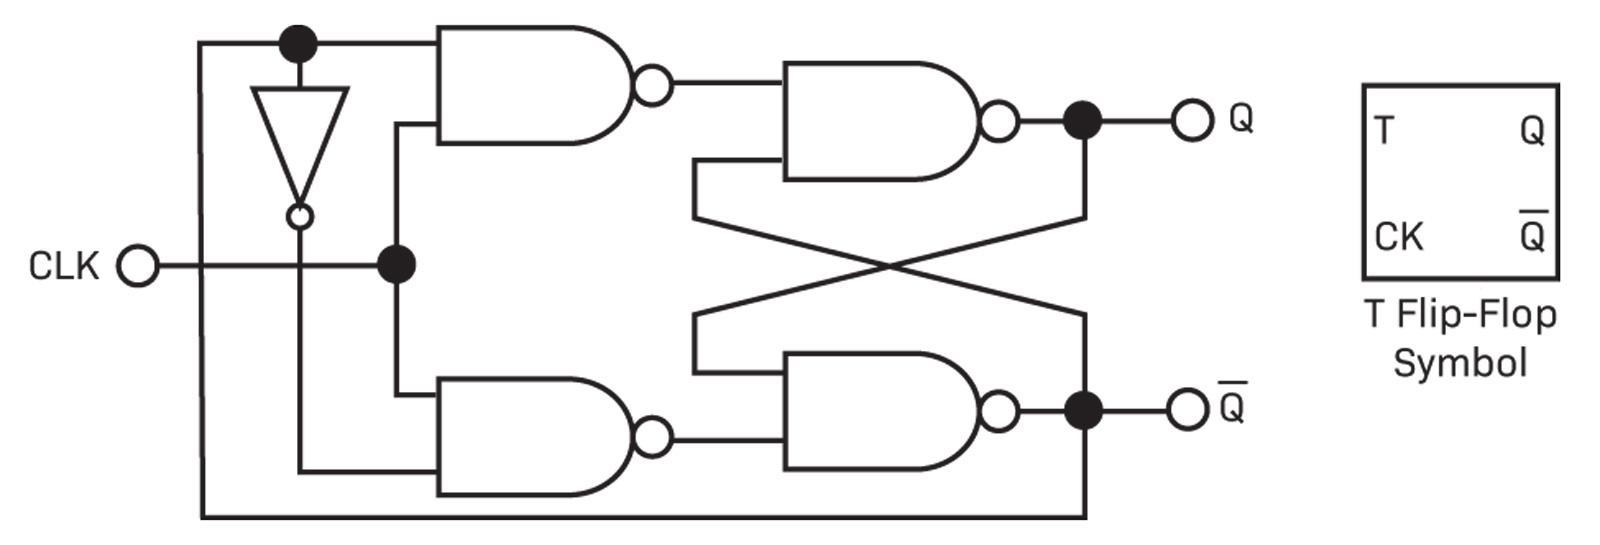 Working Of Jk Flip Flop Using Cd4027 Circuit Eeweb Community